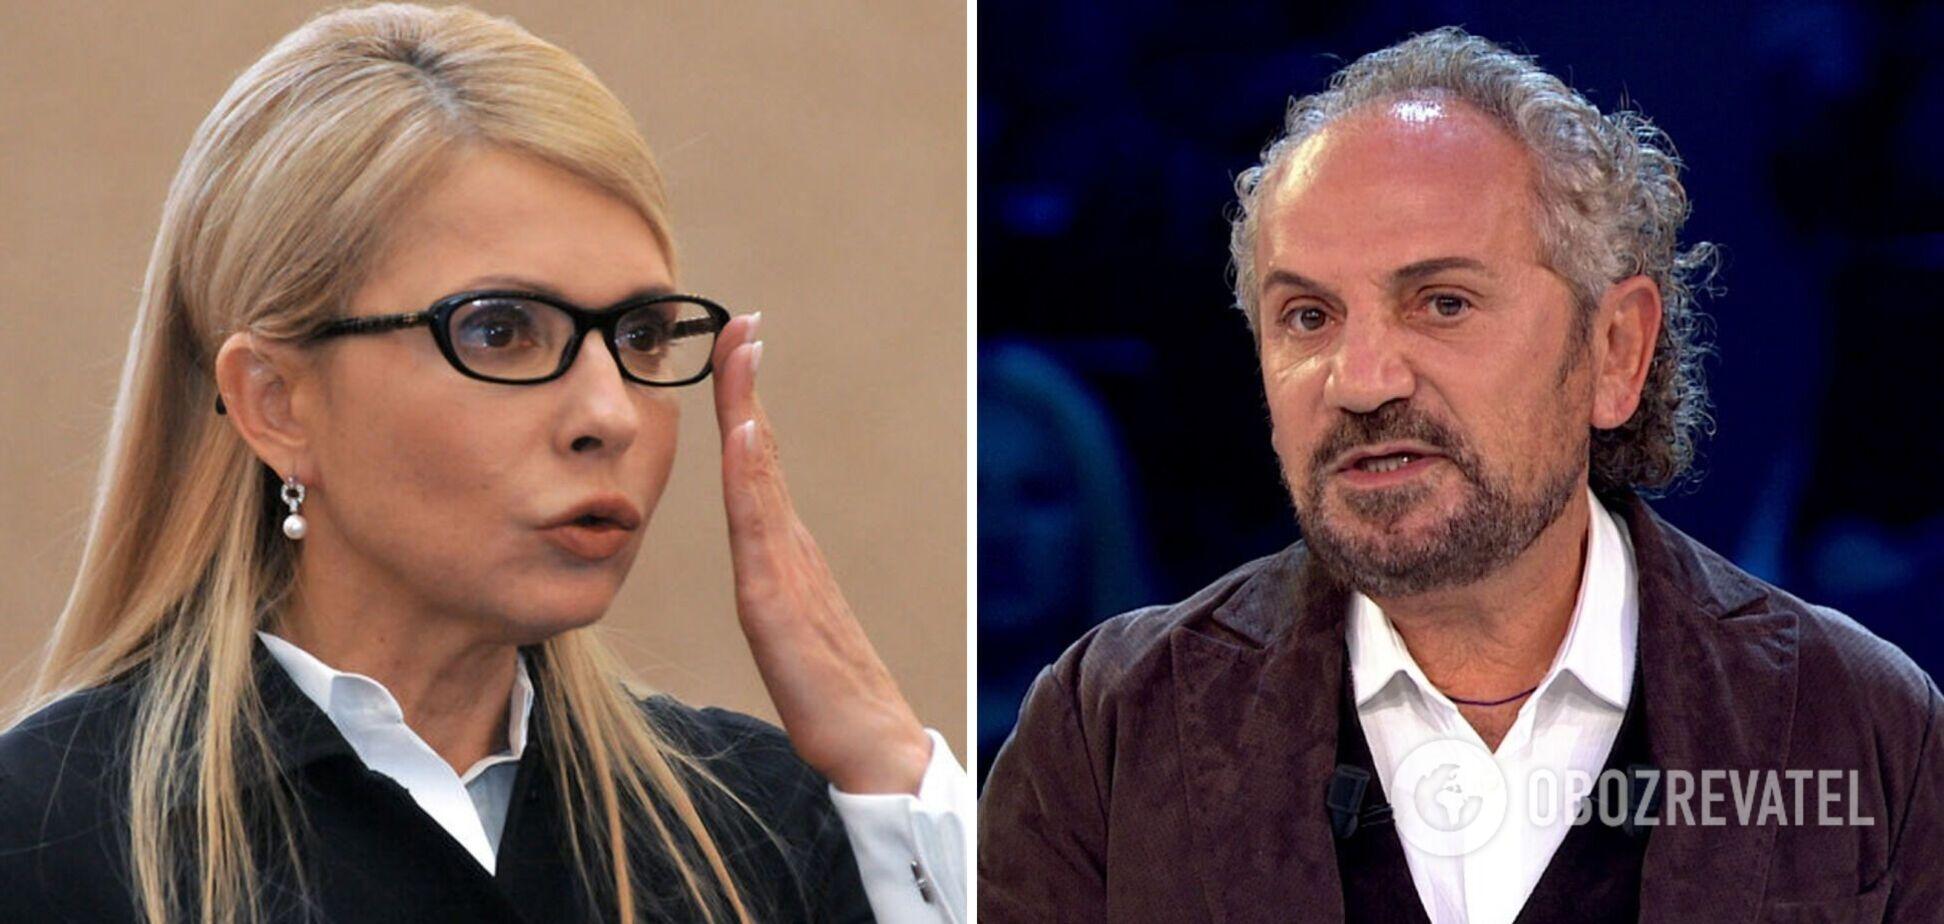 Тимошенко заявила про плани влади закрити 'Свободу слова Савіка Шустера' та прибрати журналіста з України. Відео